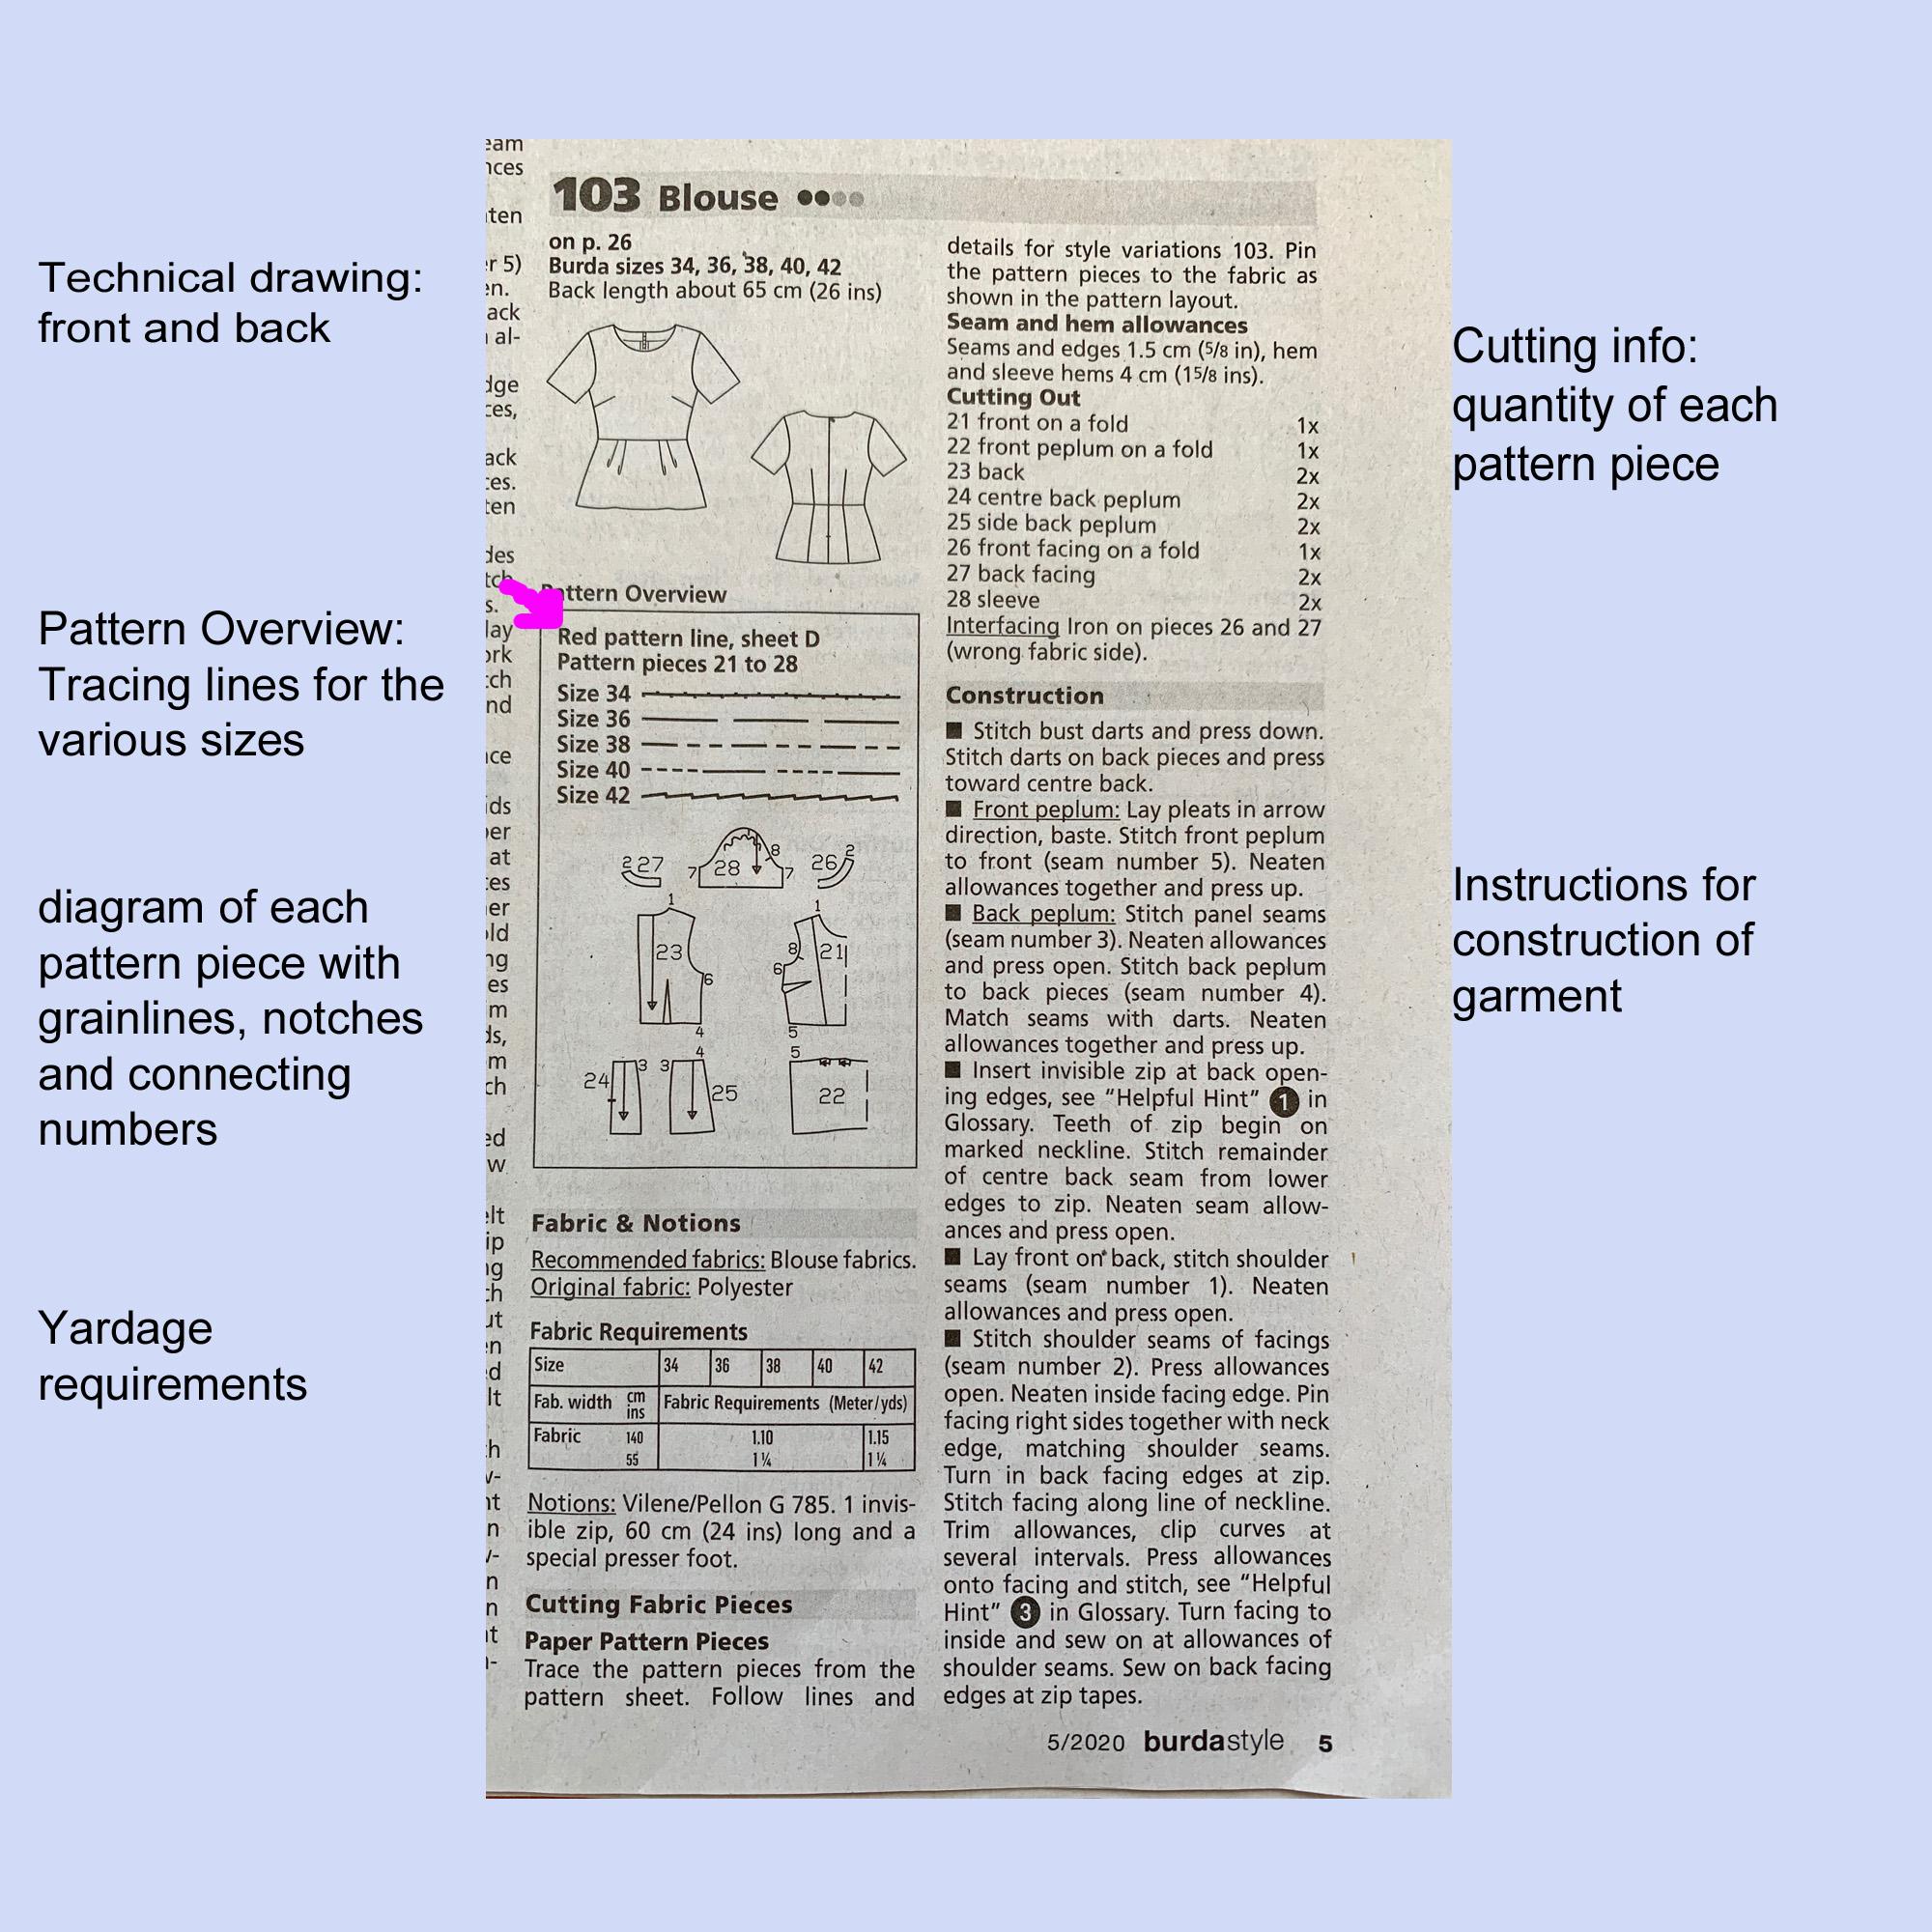 Burda 052020 103 instructions page